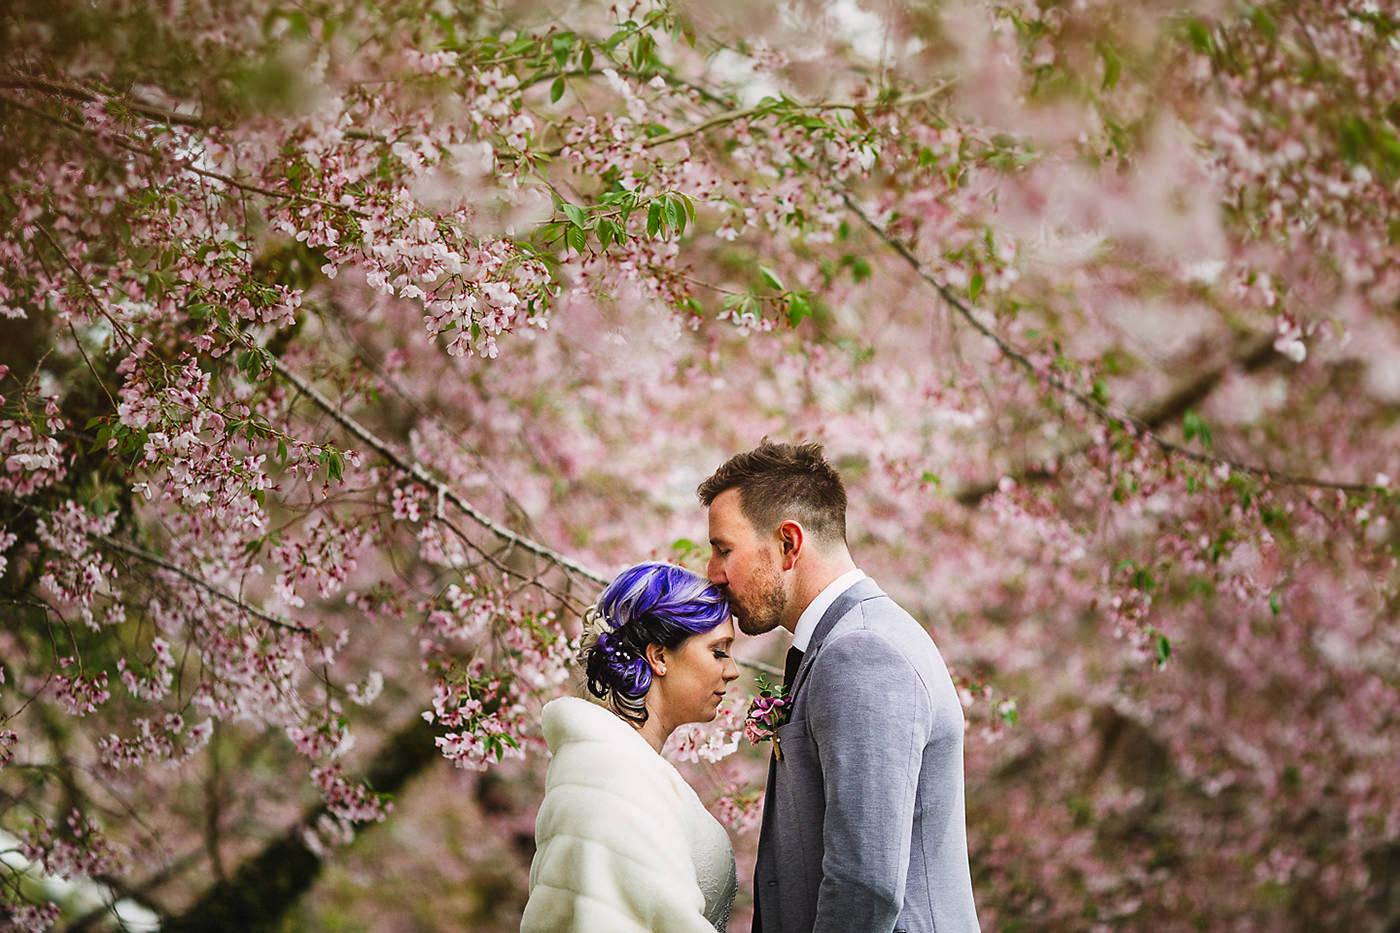 wedding_photographer_nz-00038.jpg